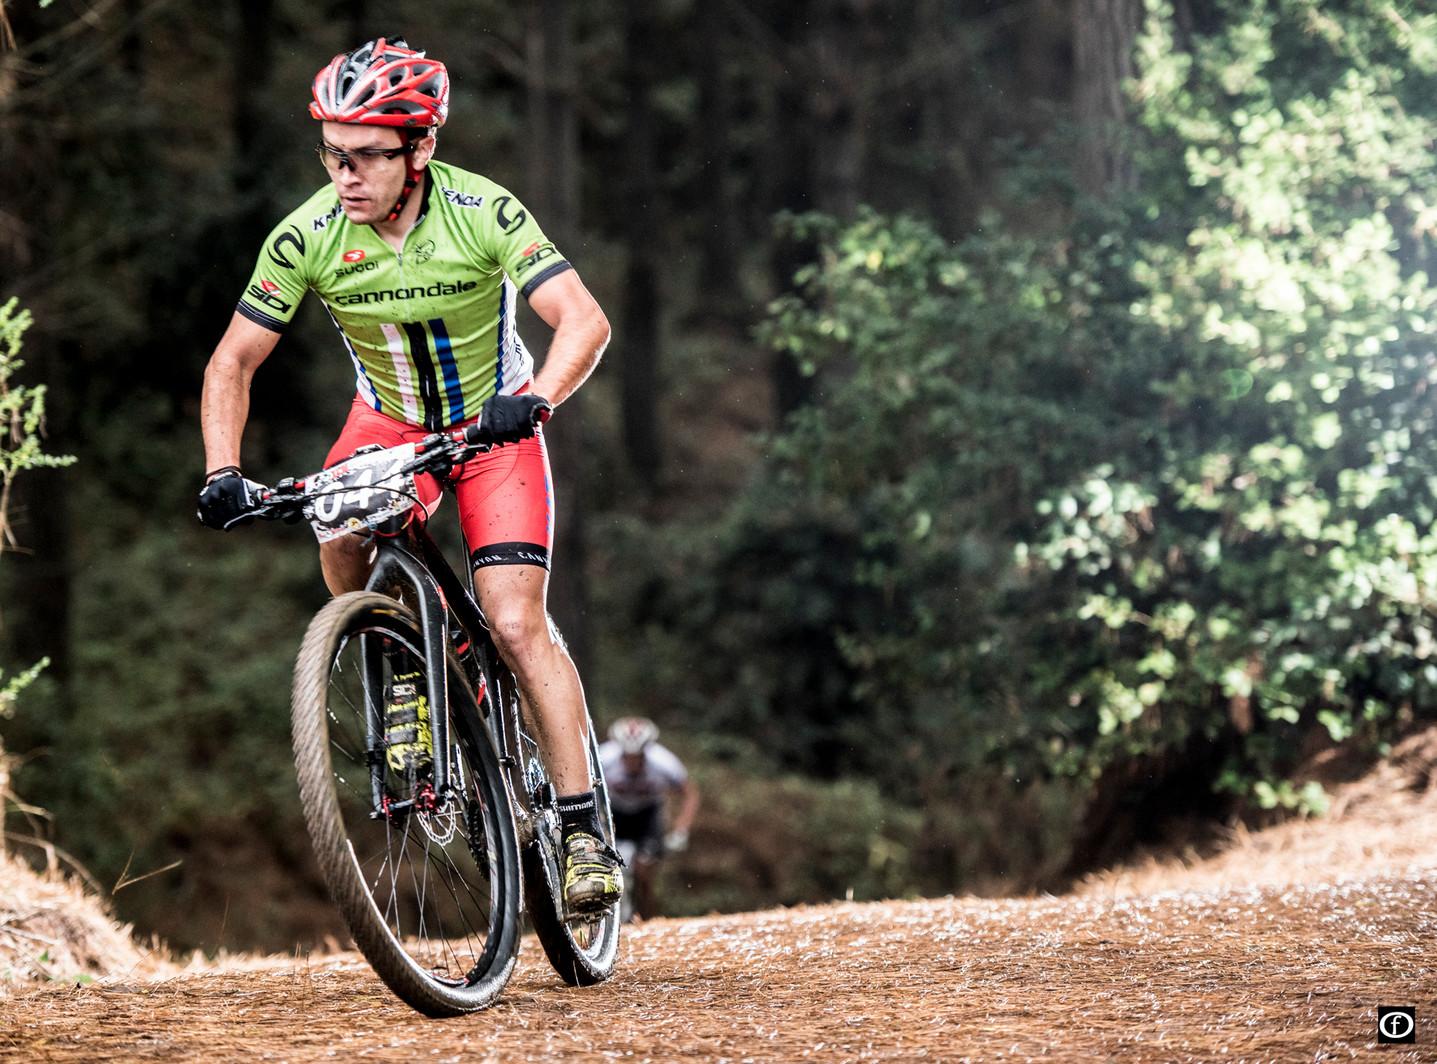 2015-05-17-Ciclismo Enduro.jpg